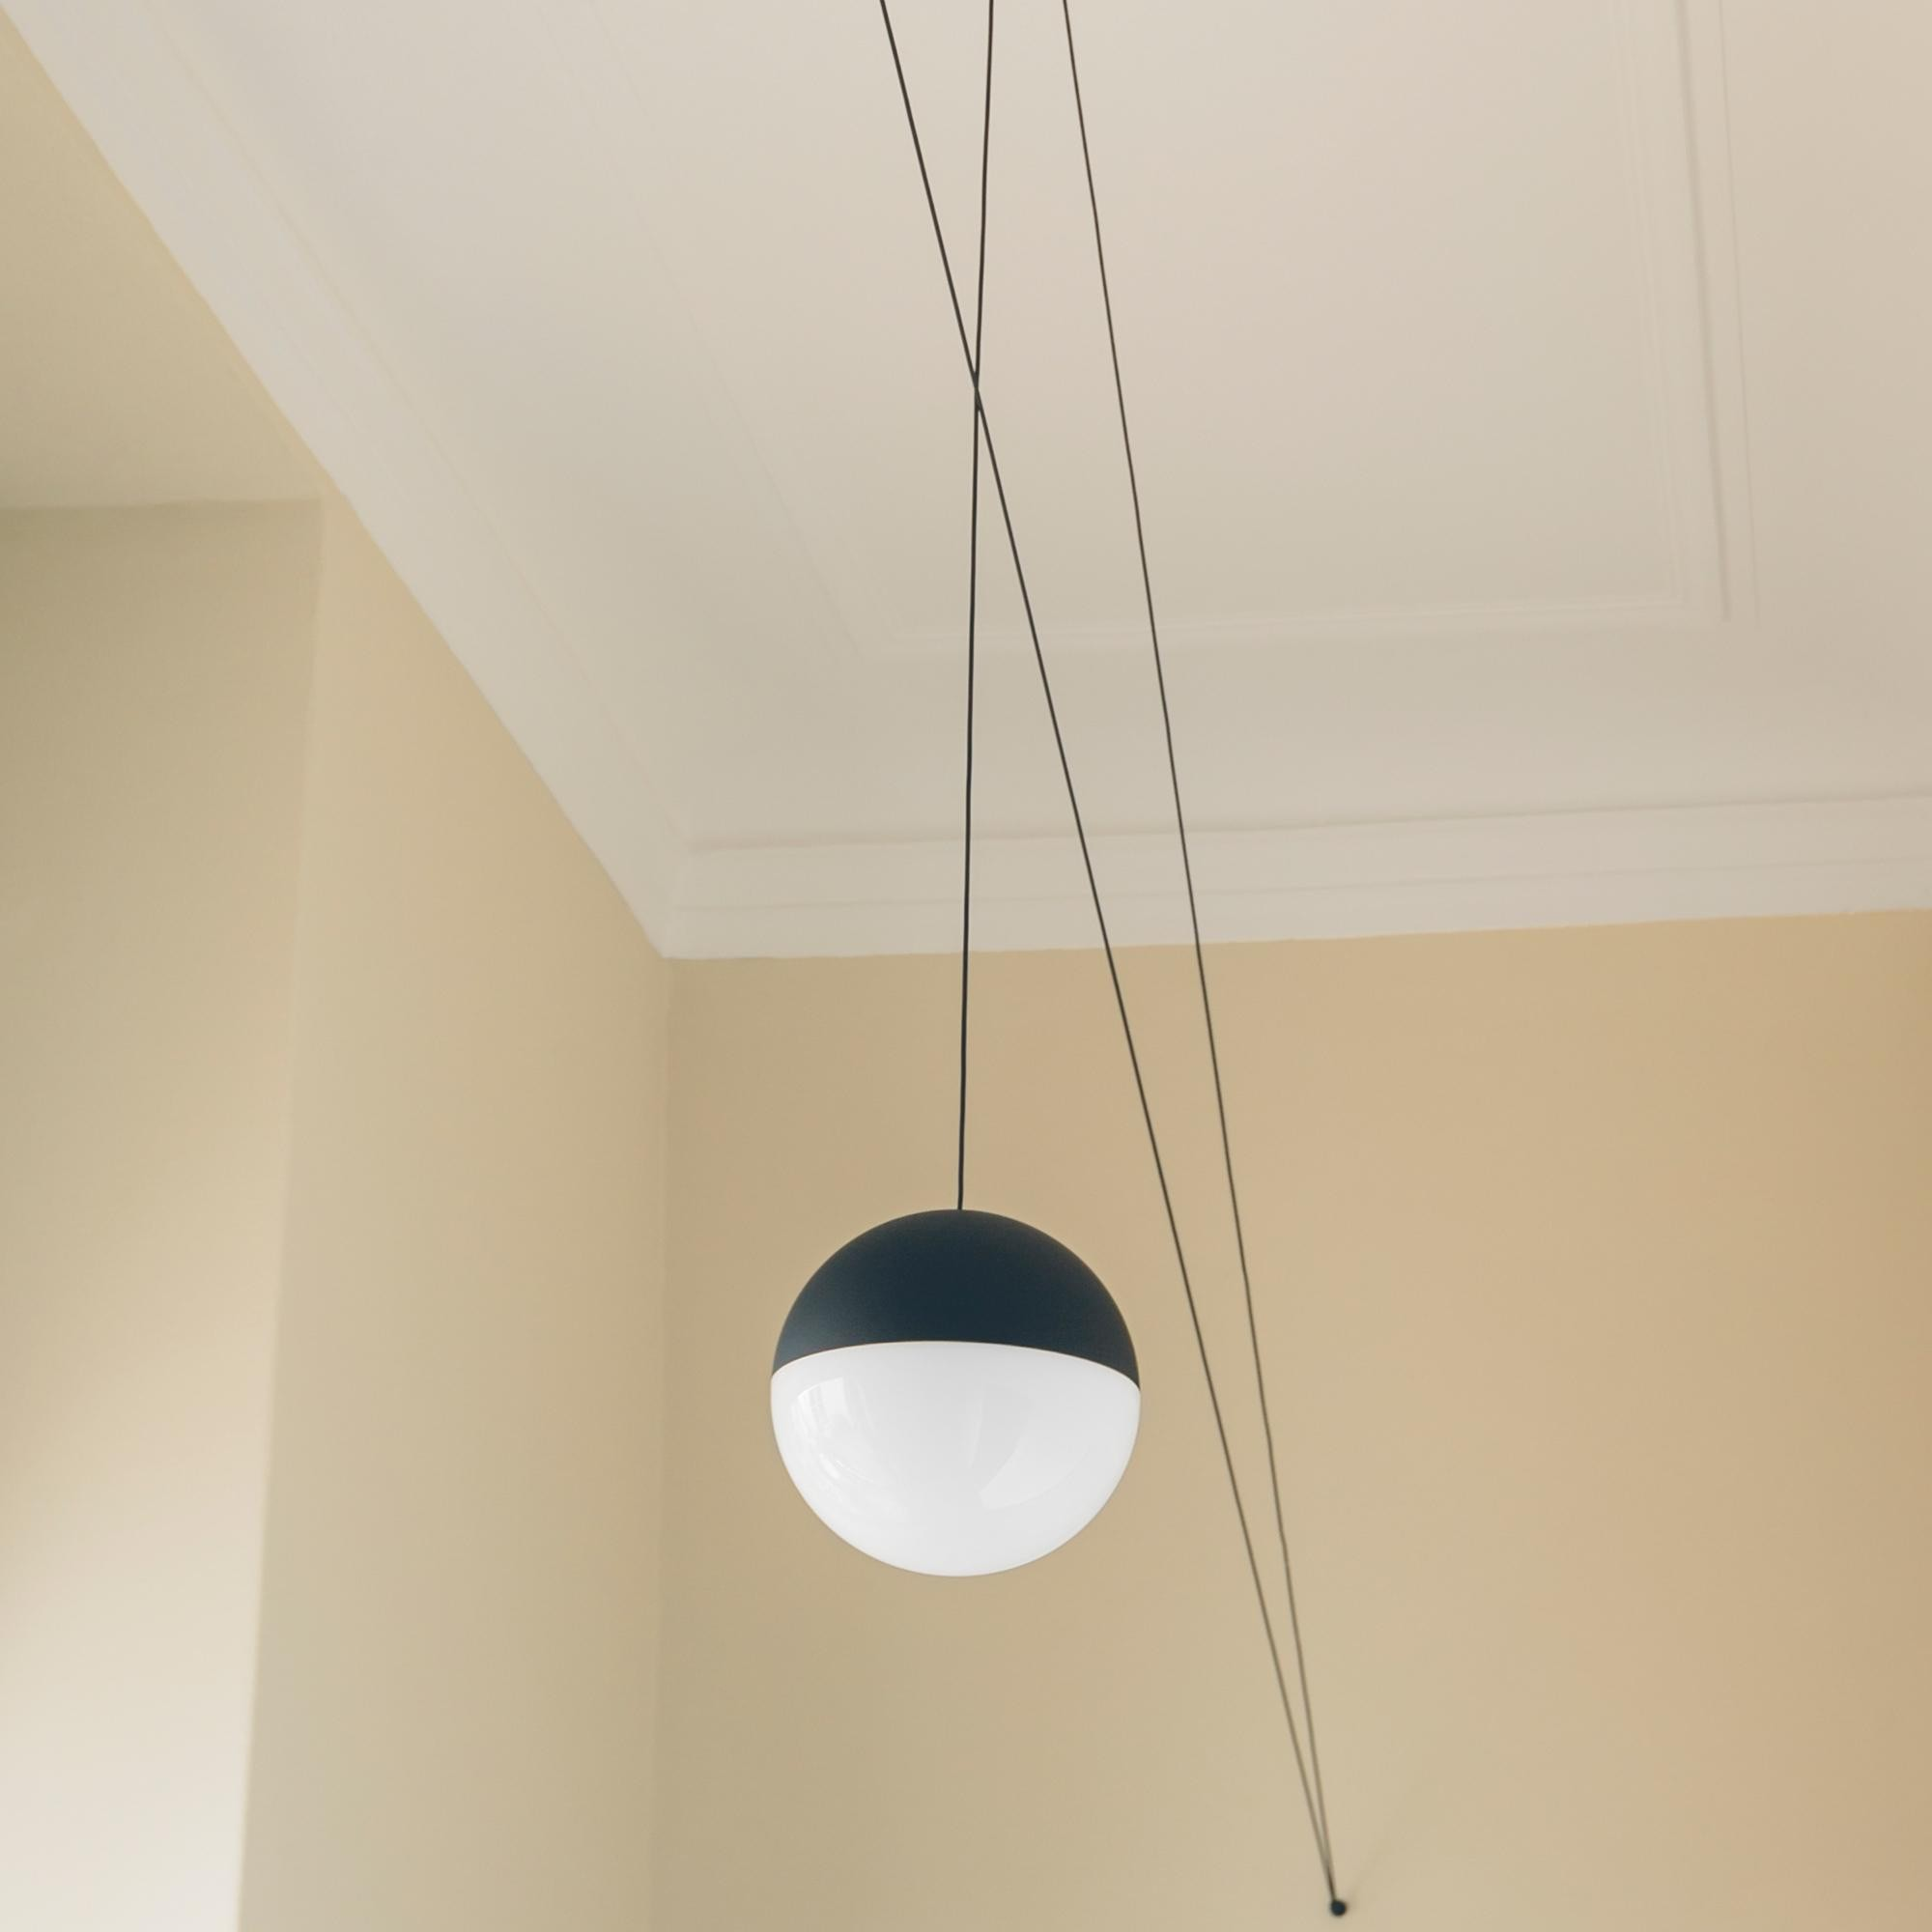 string lights led suspension lamp spherical